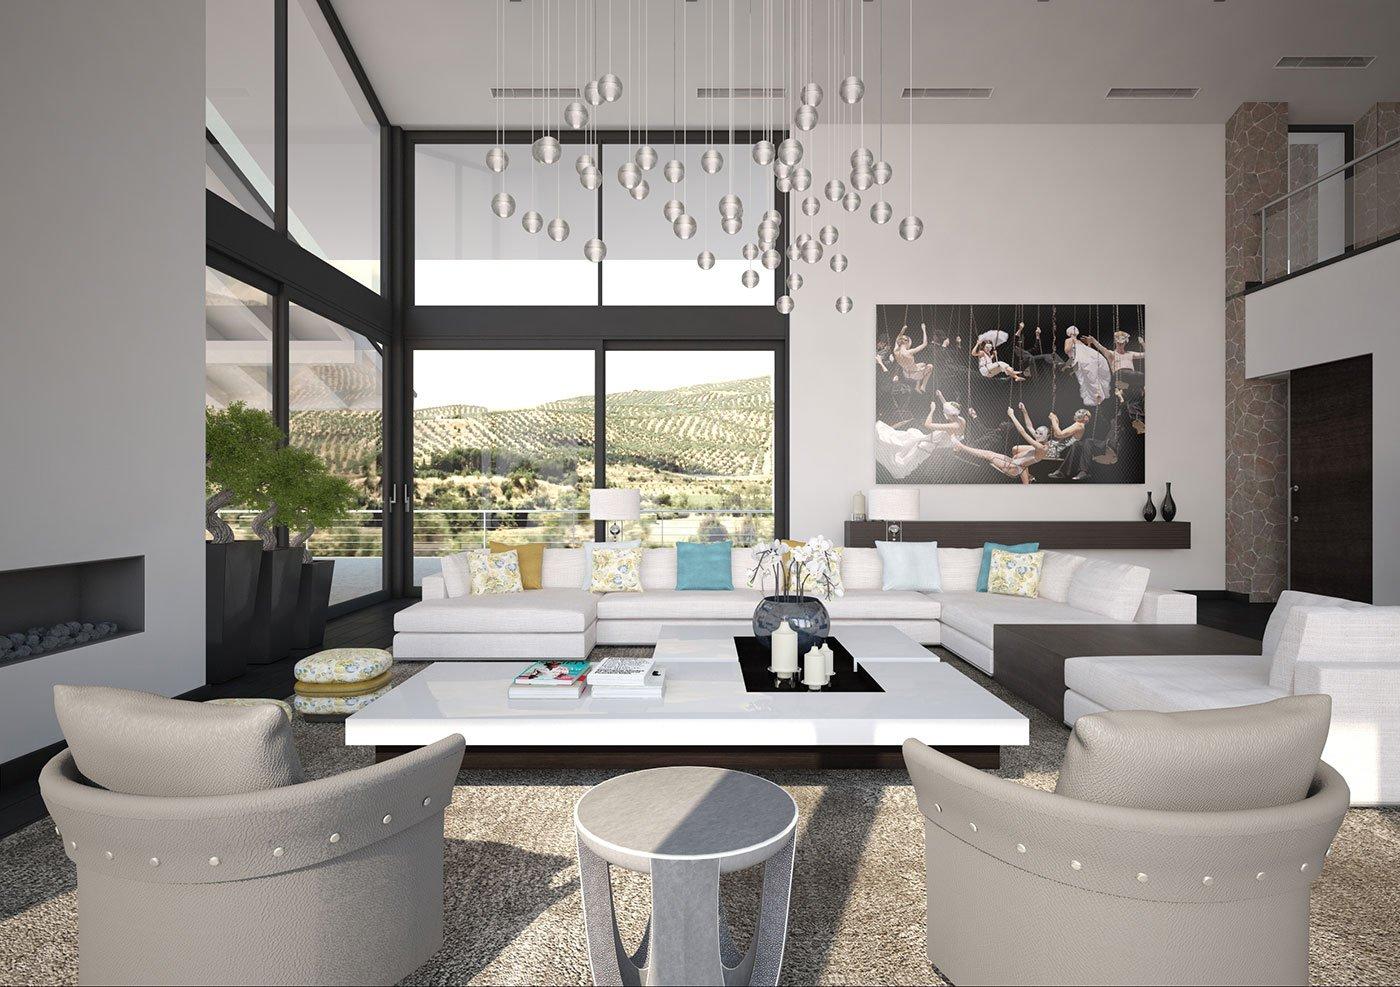 la-zagaleta-ambience-home-design-01